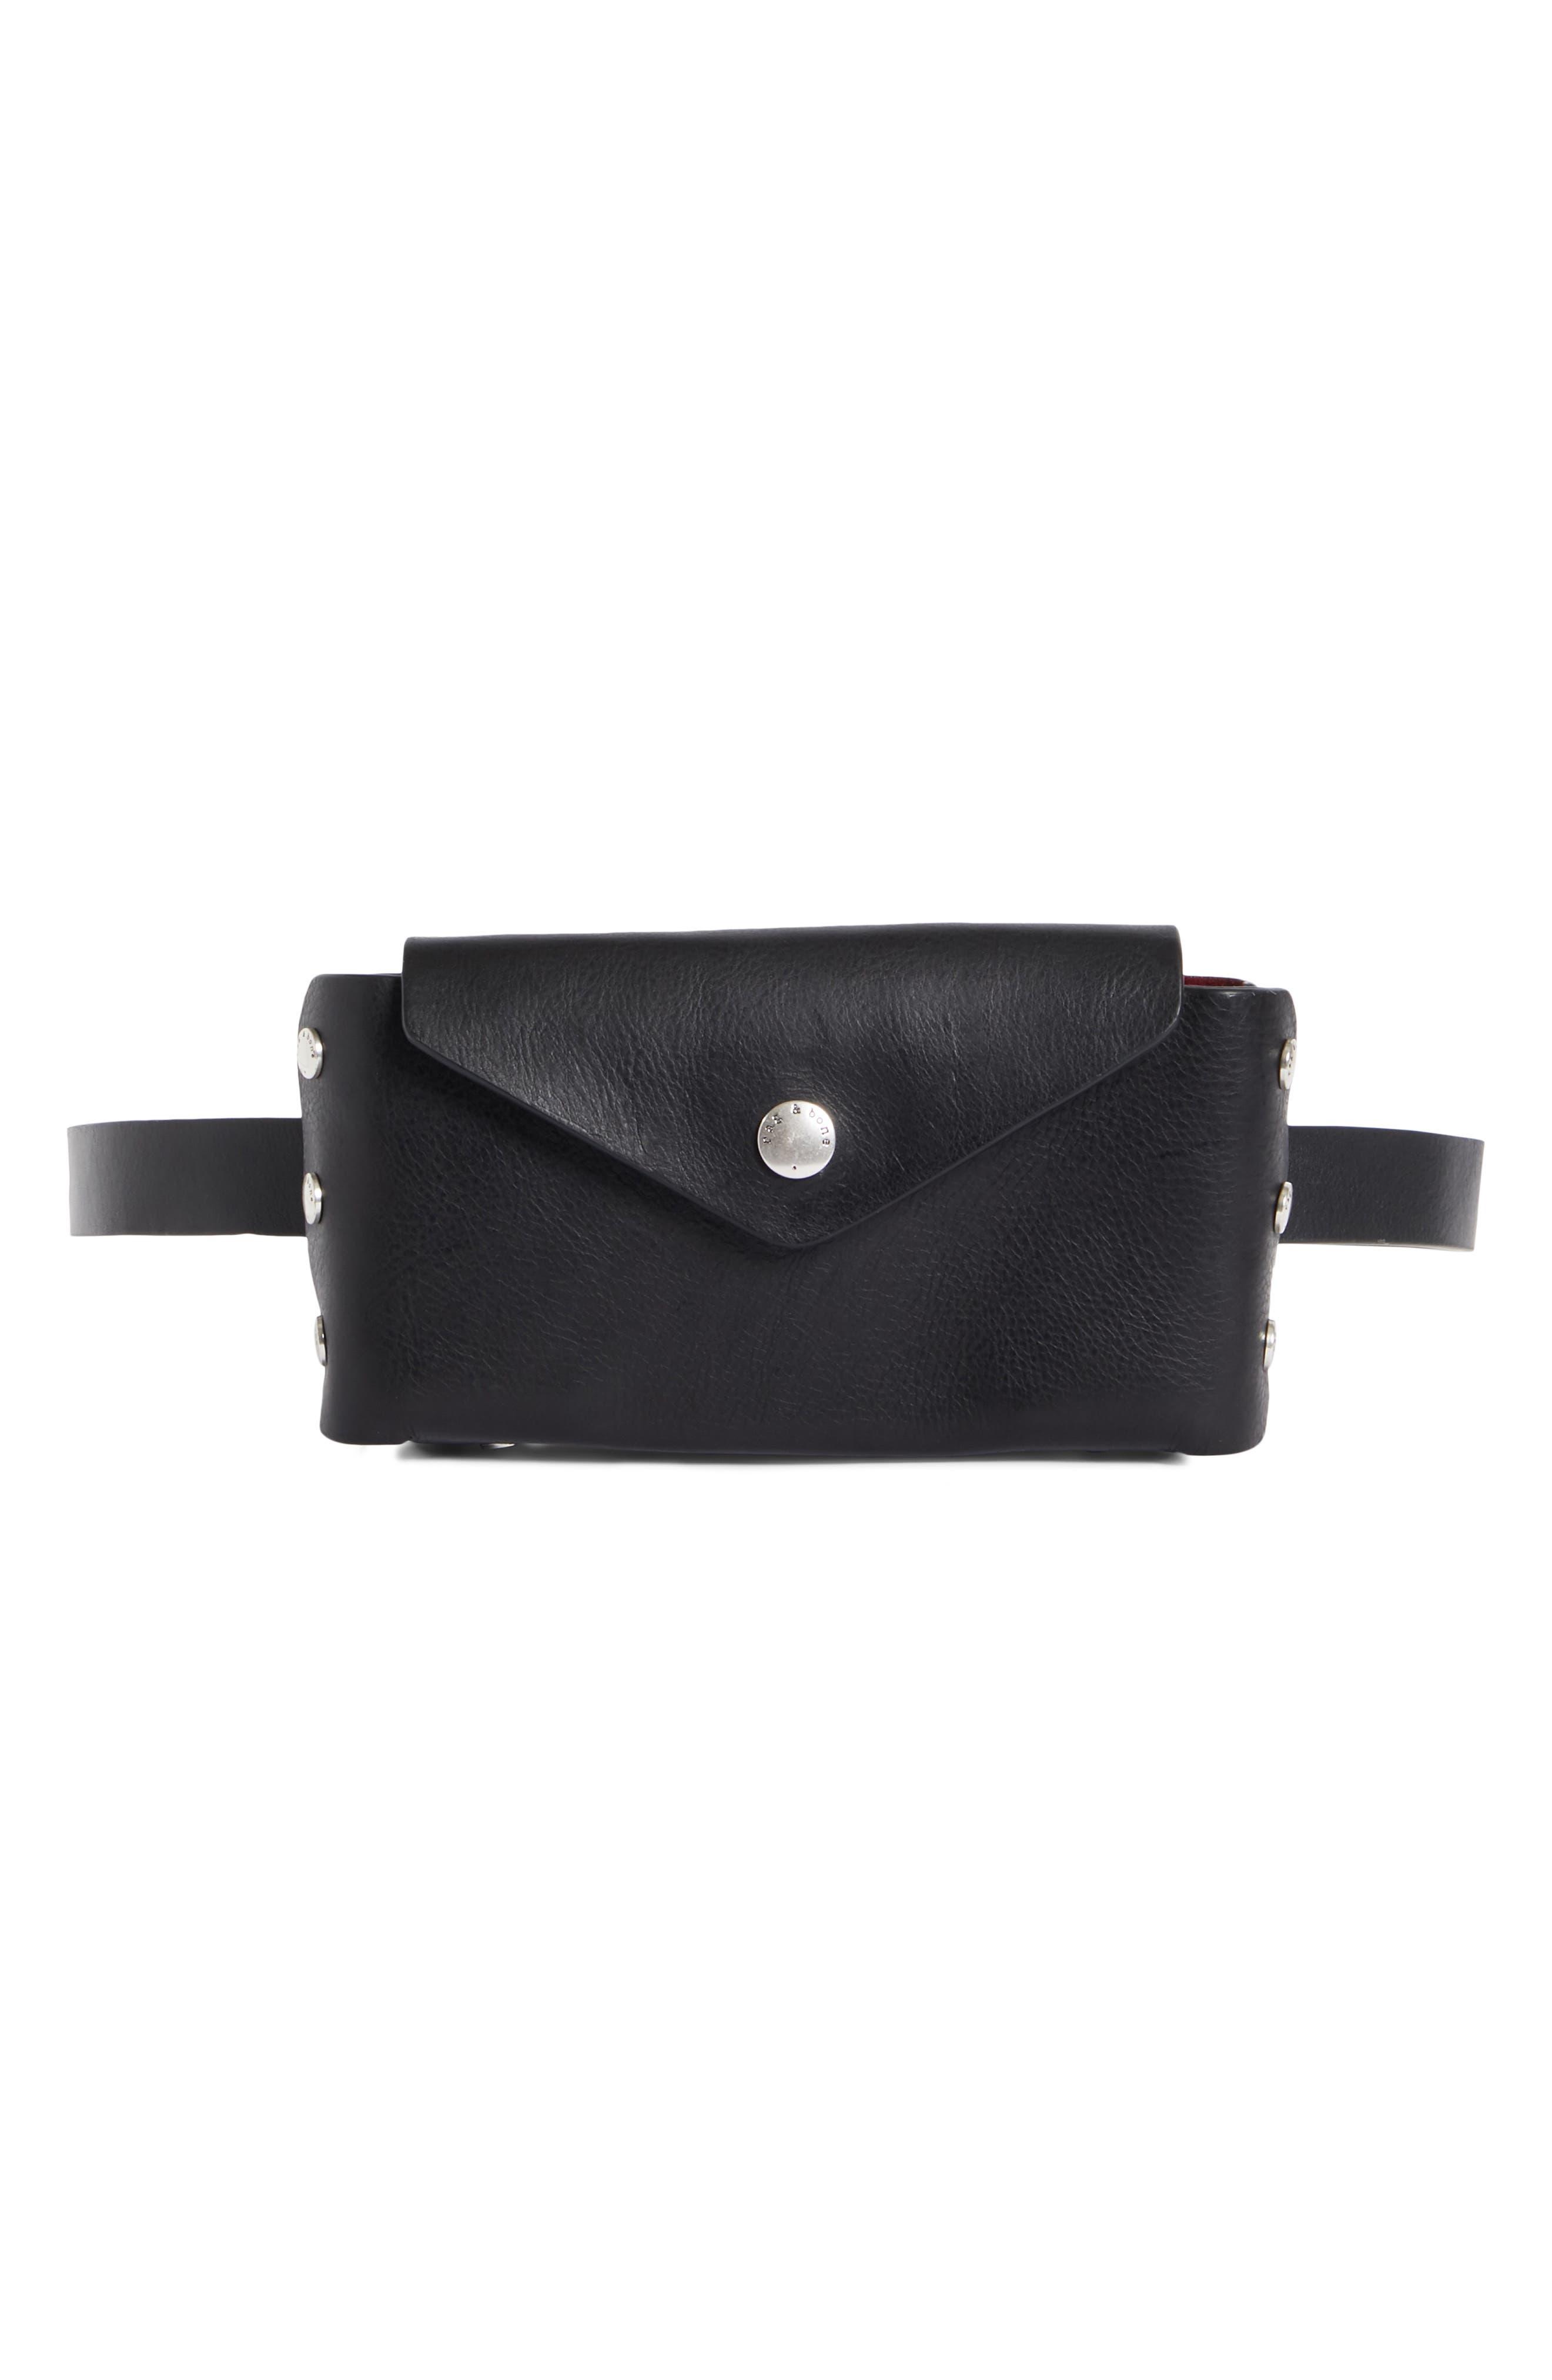 Atlas Leather Belt Bag,                             Main thumbnail 1, color,                             BLACK/ BIKING RED